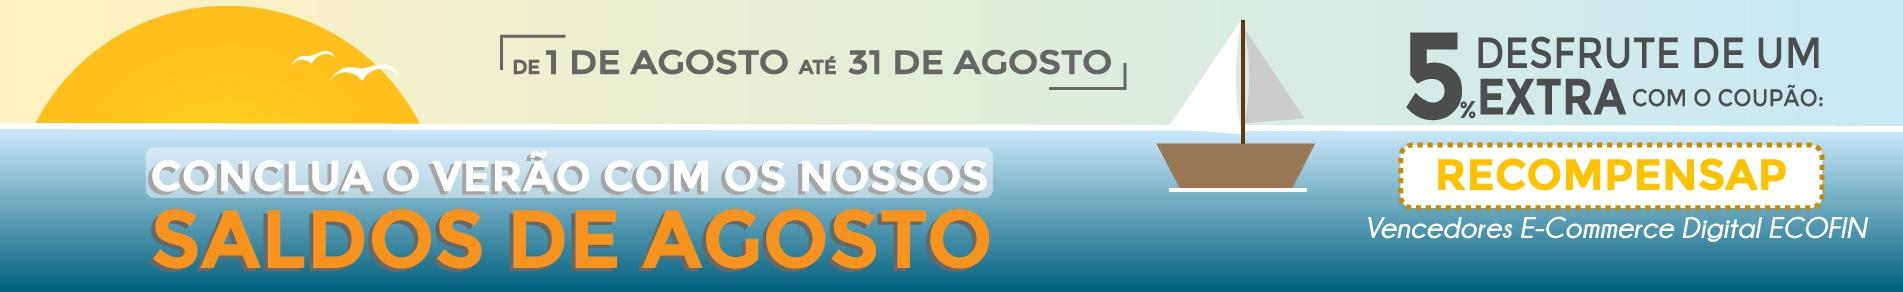 SALDOS DE AGOSTO